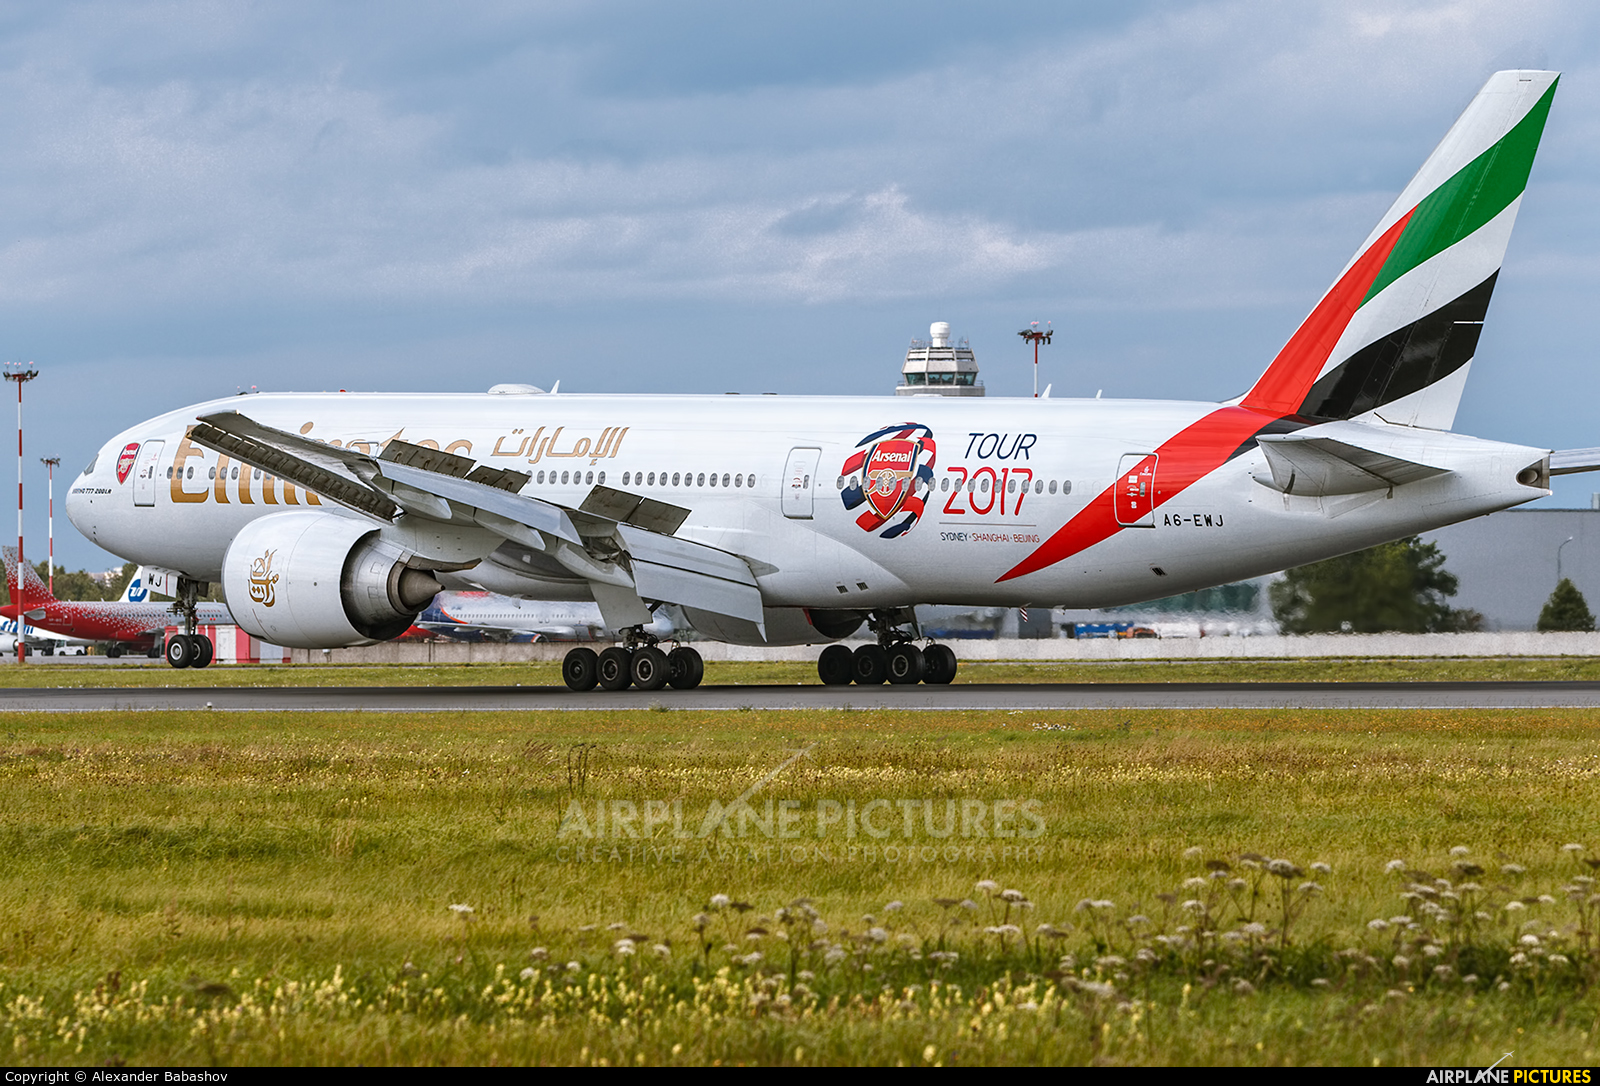 Emirates Airlines A6-EWJ aircraft at St. Petersburg - Pulkovo